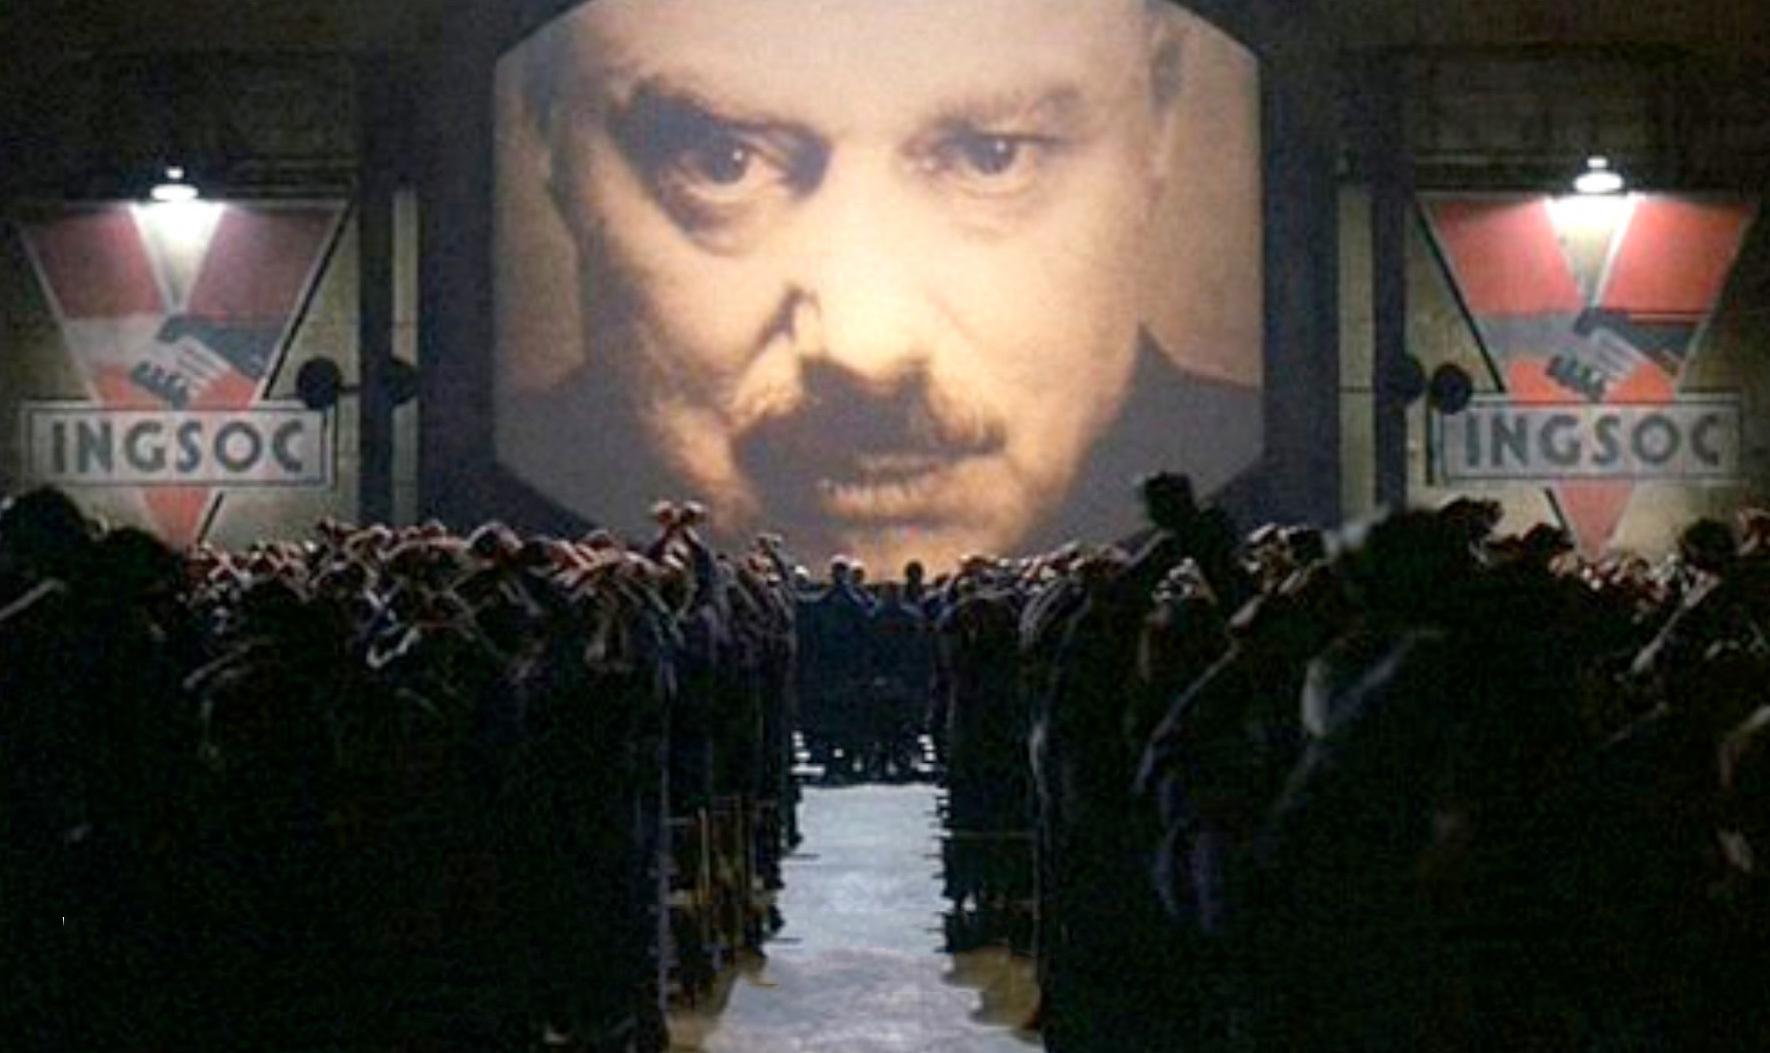 Dystopian reality: GameStop now taking your fingerprints ...